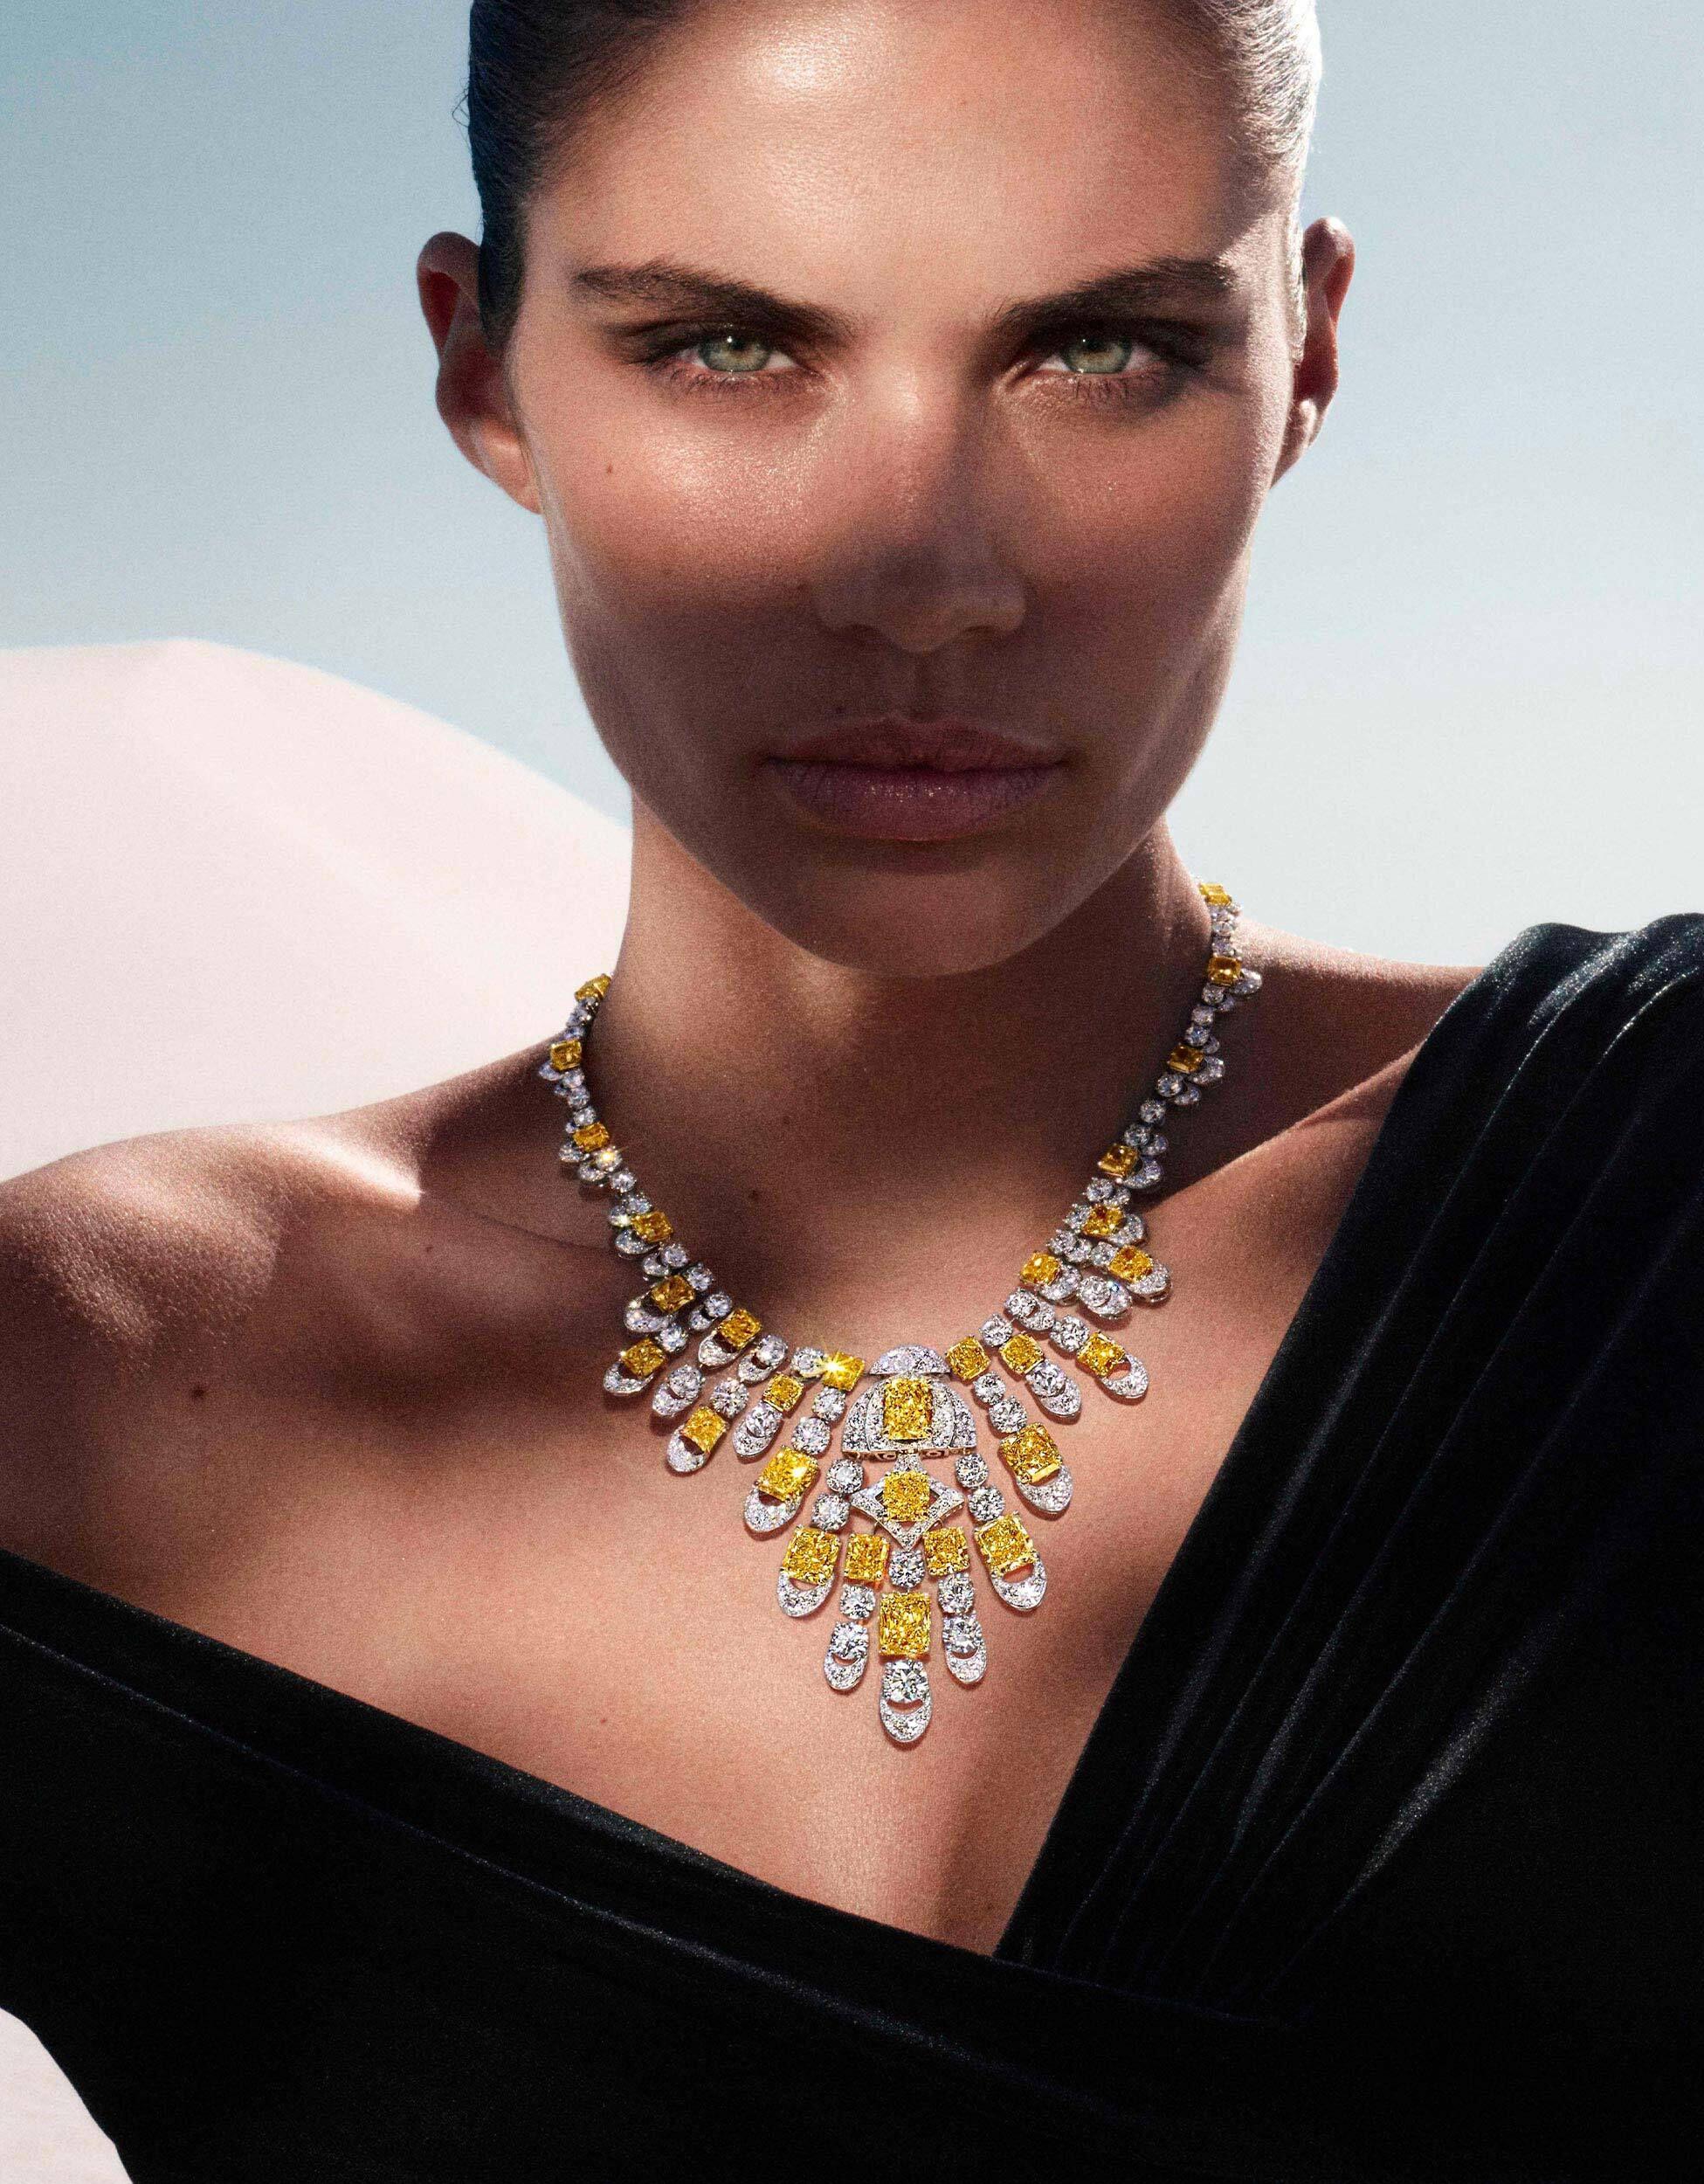 Sara Sampaio wears Graff Night Moon yellow and white diamond necklace, in a desert